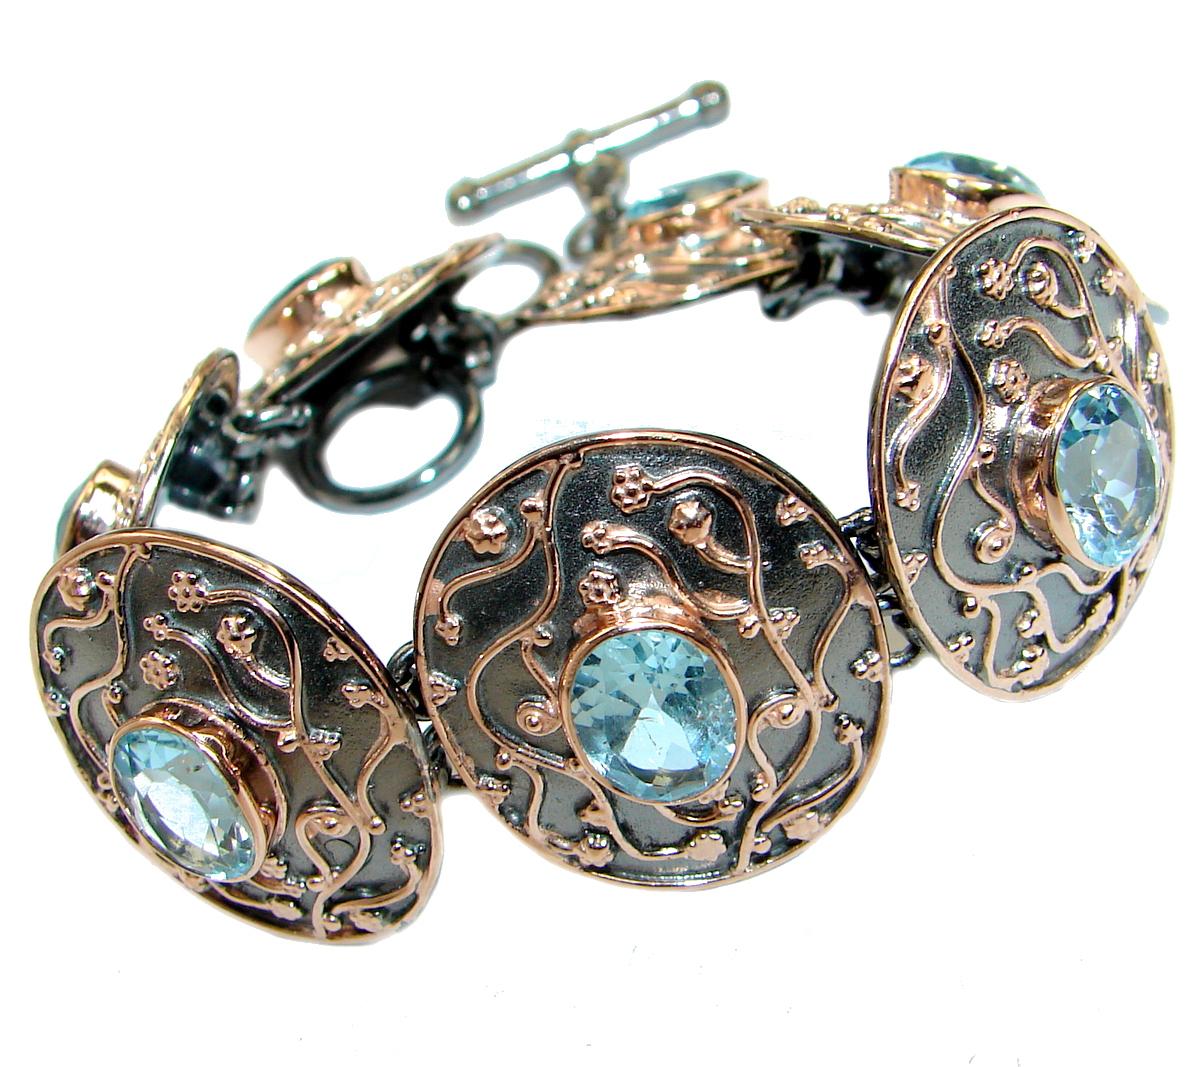 Baroque Style Swiss Blue Topaz Two Tones .925 Sterling Silver handmade Bracelet Cuff